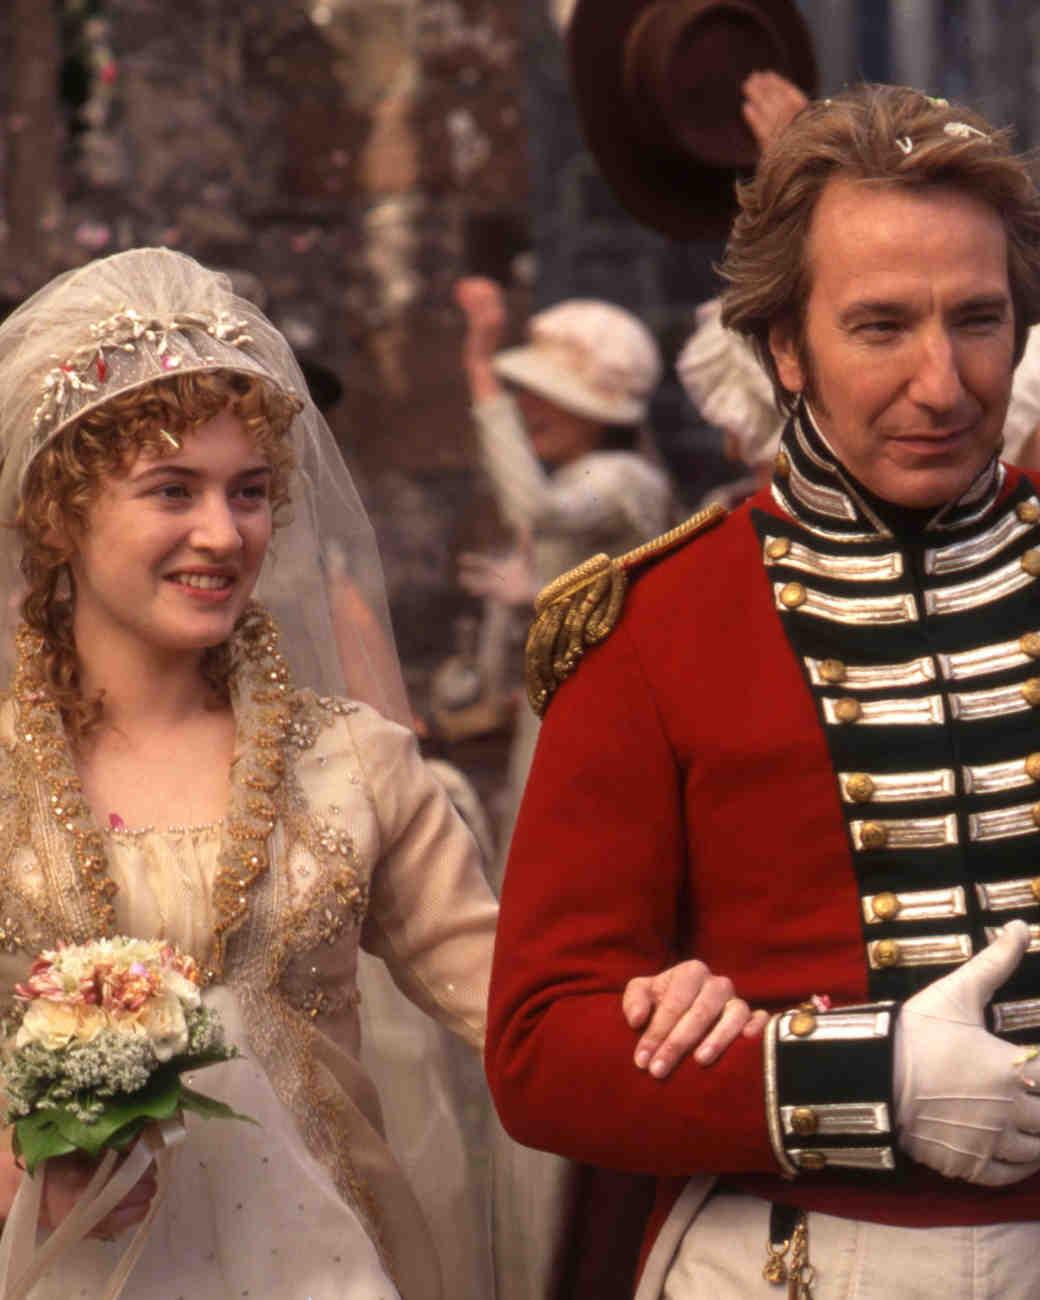 movie-wedding-dresses-sense-sensibility-alan-rickman-kate-winslet-0216.jpg